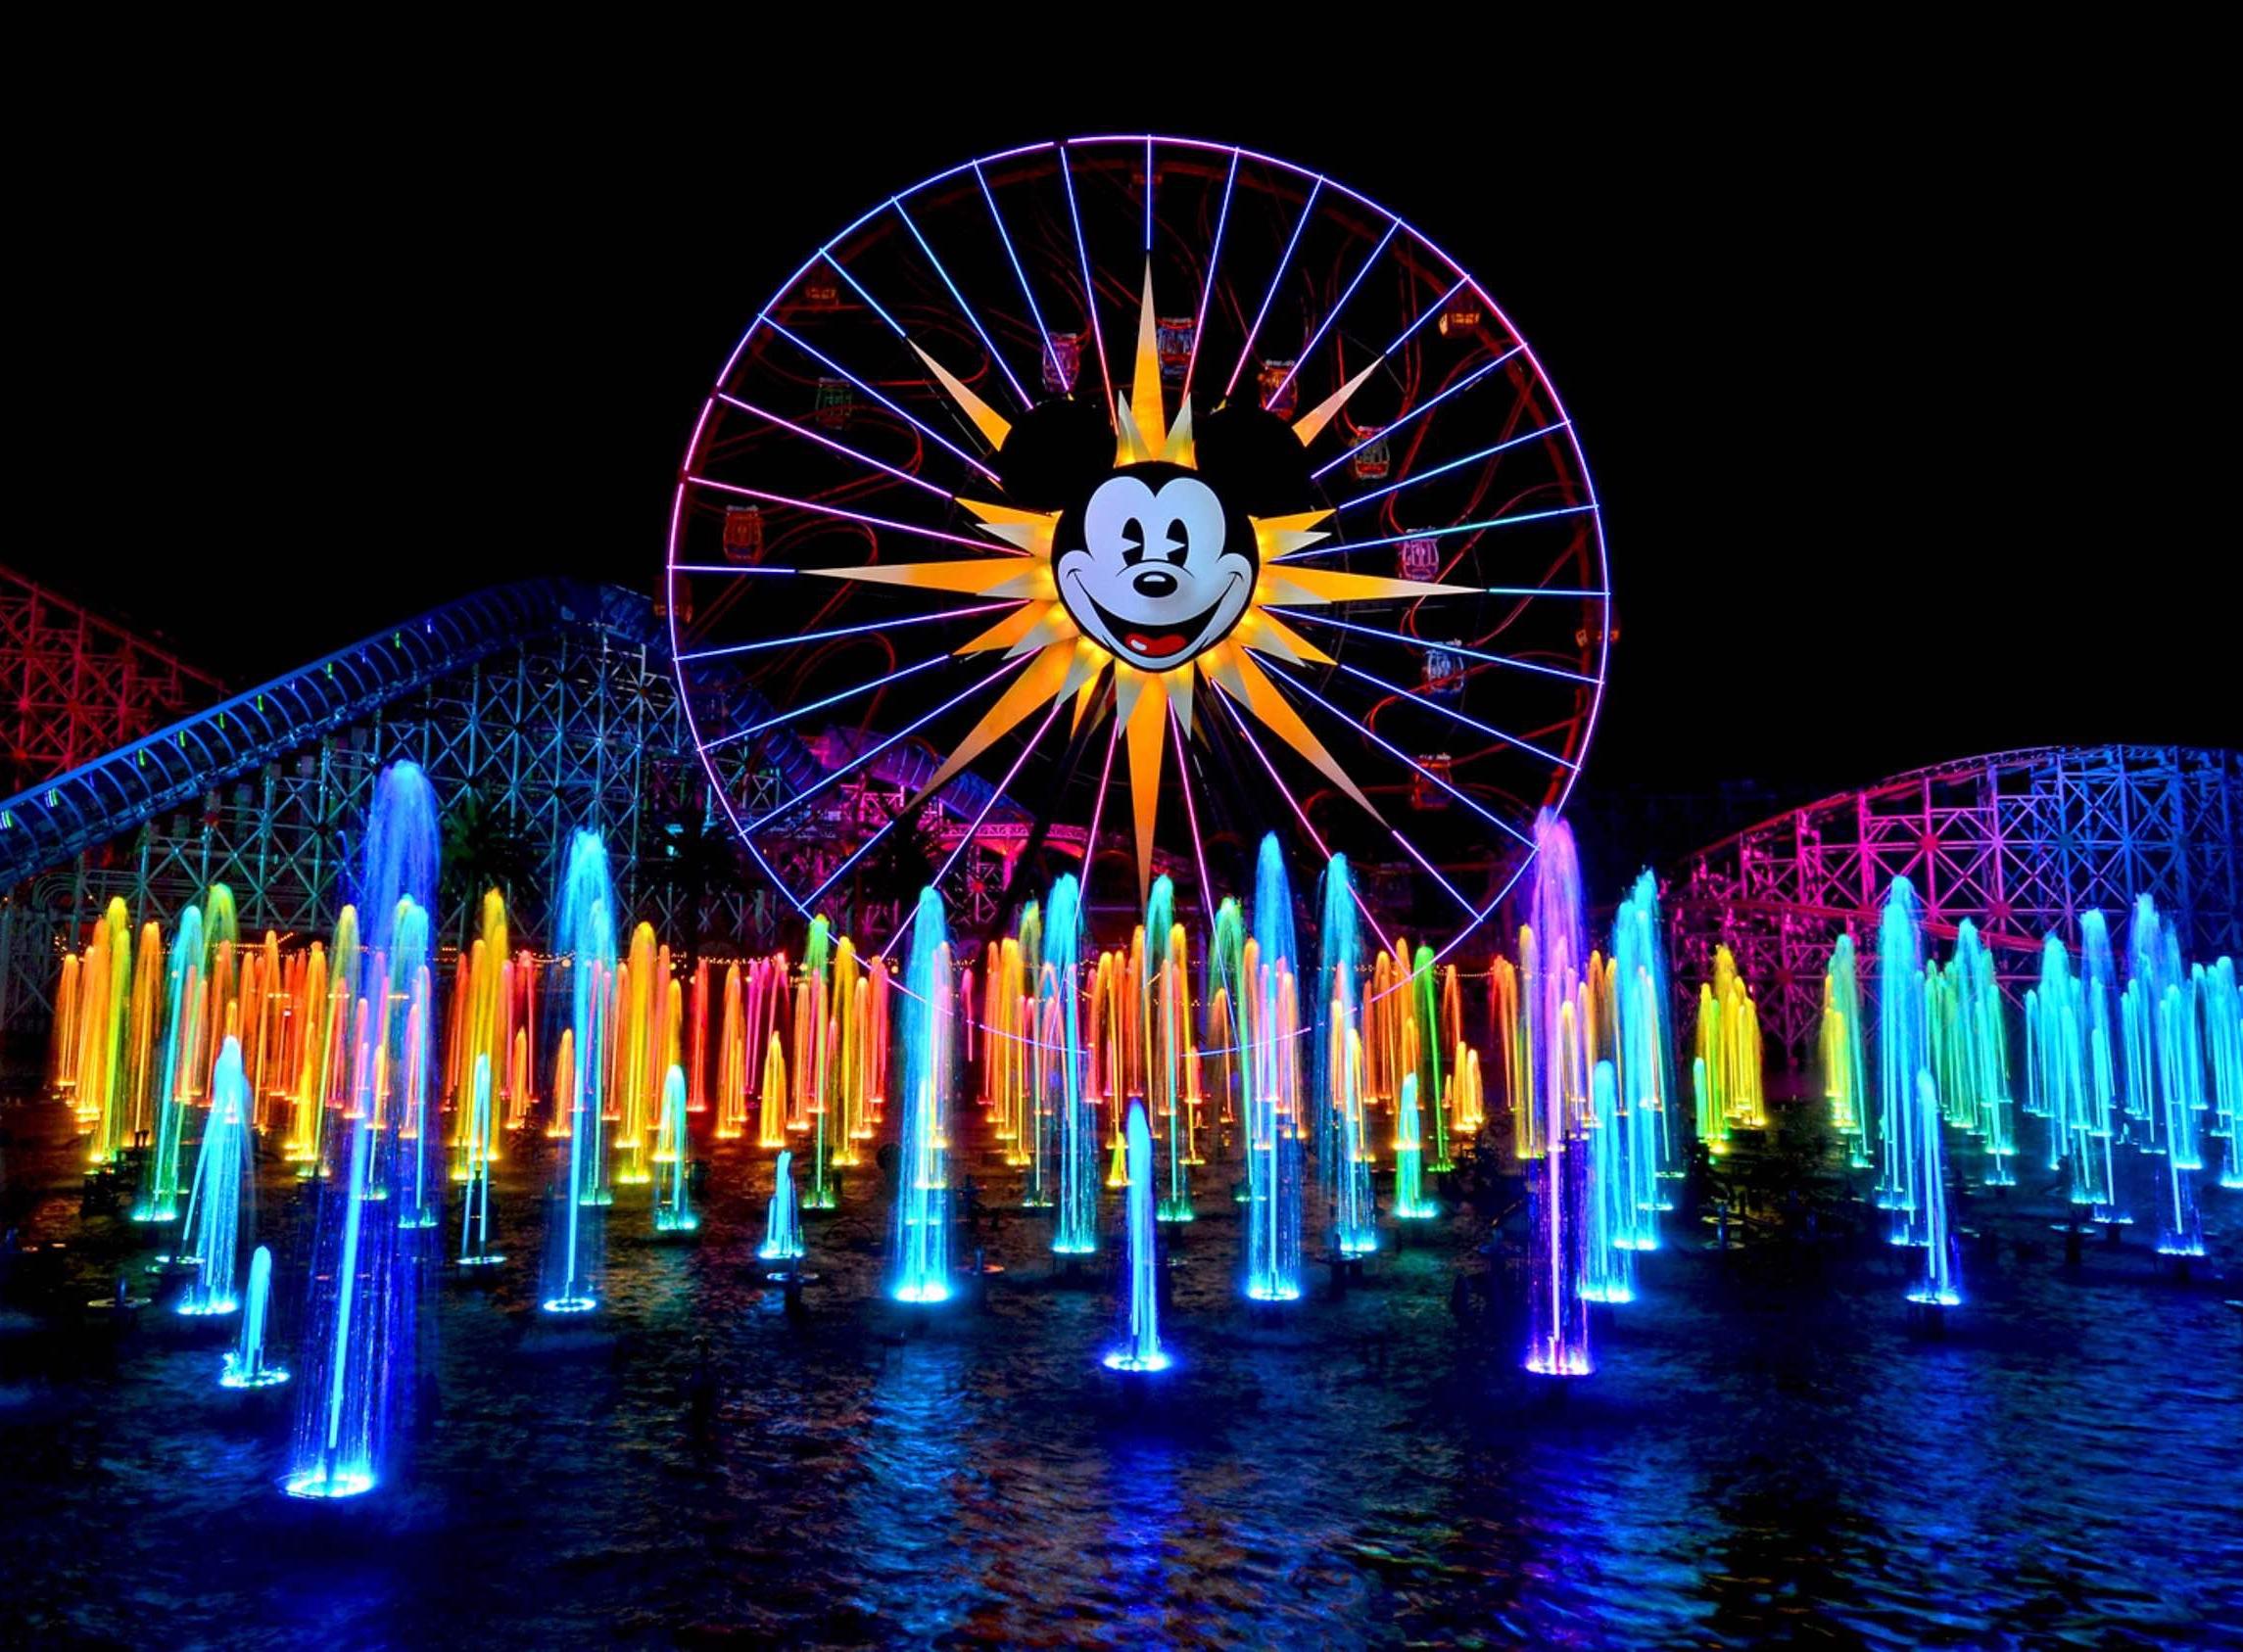 8/World of Color at Disney's California Adventure